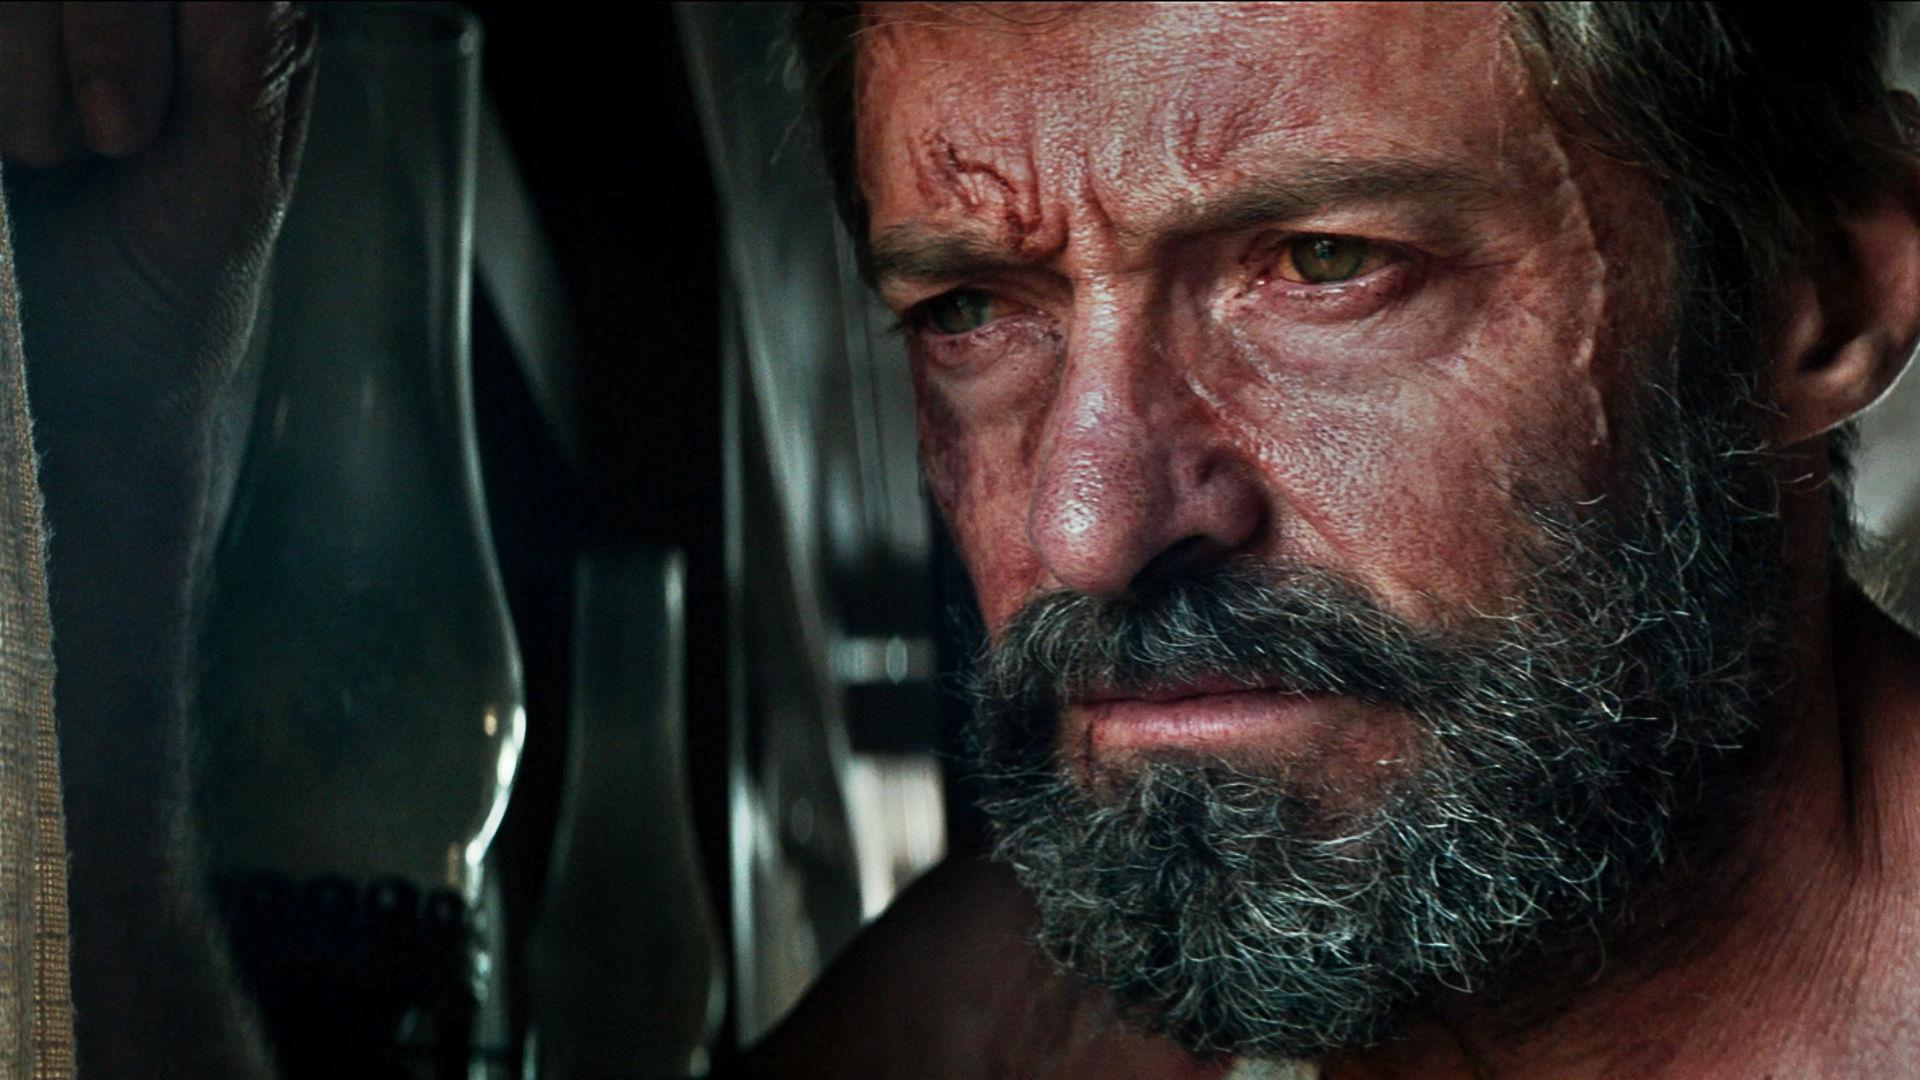 Hugh Jackman in Logan (2017)